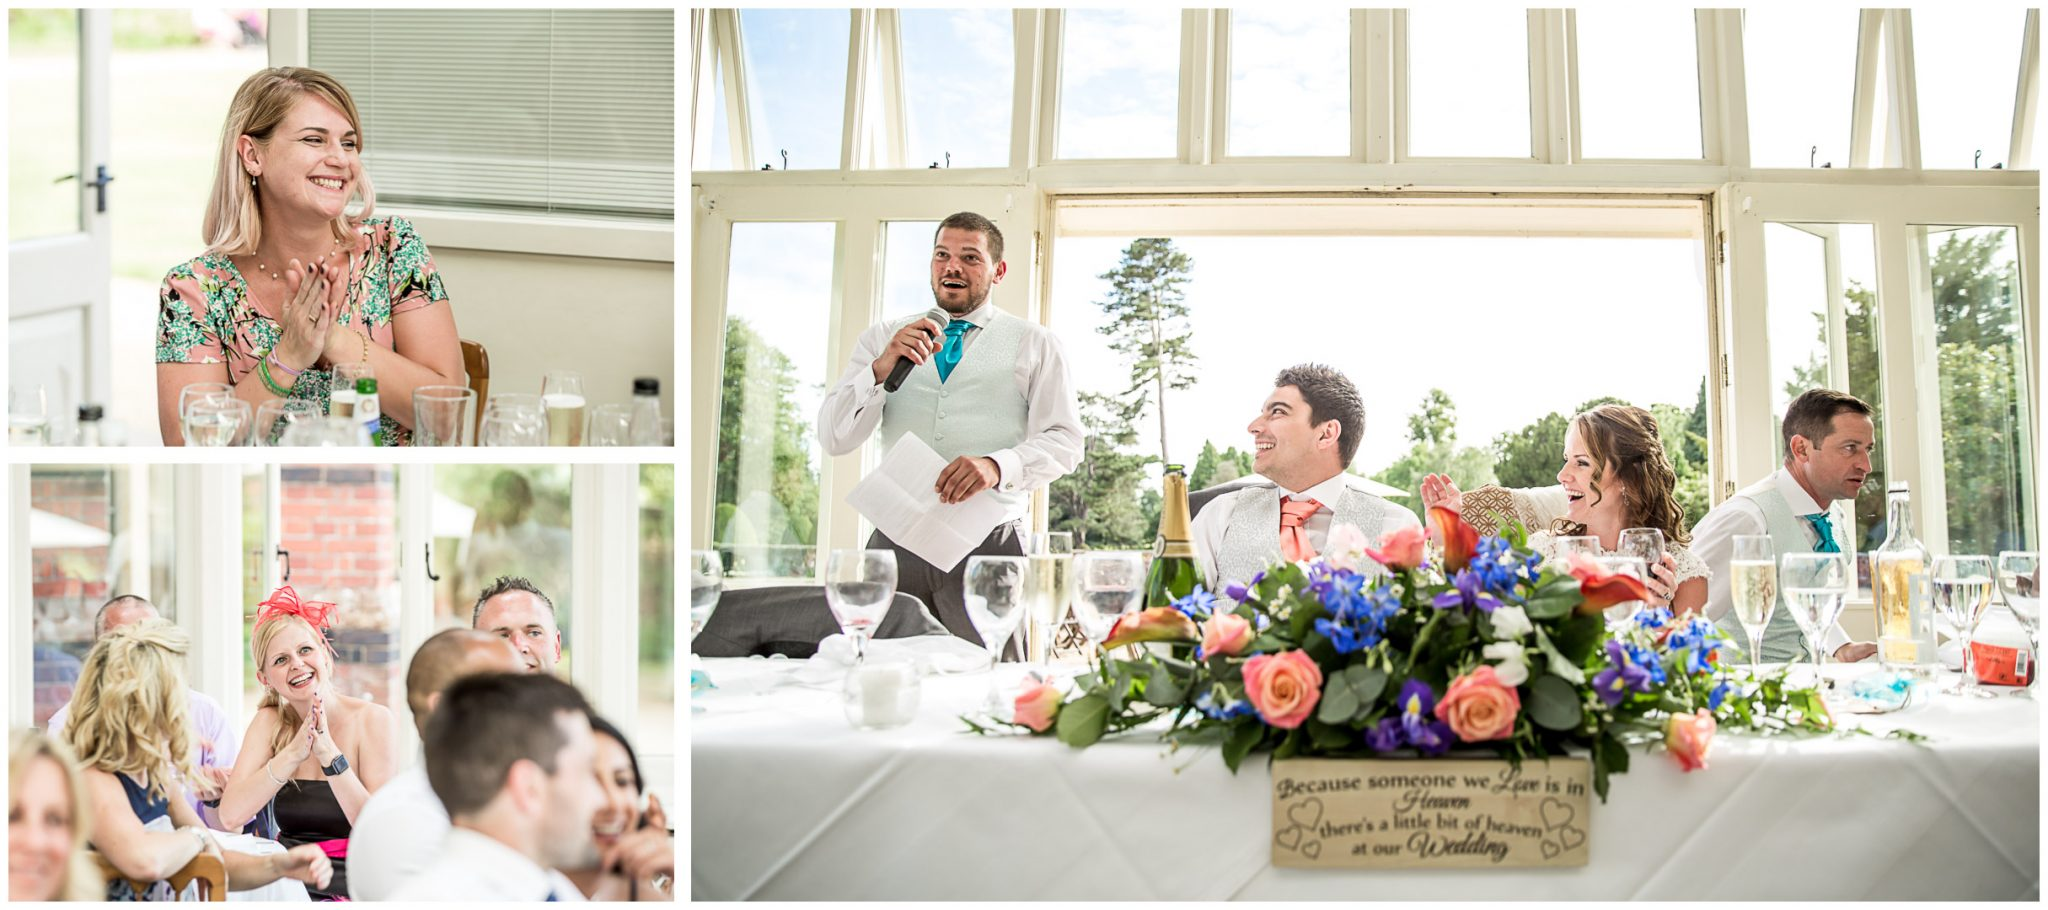 Best man giving his speech before wedding brekfast at The ELvetham Hotel